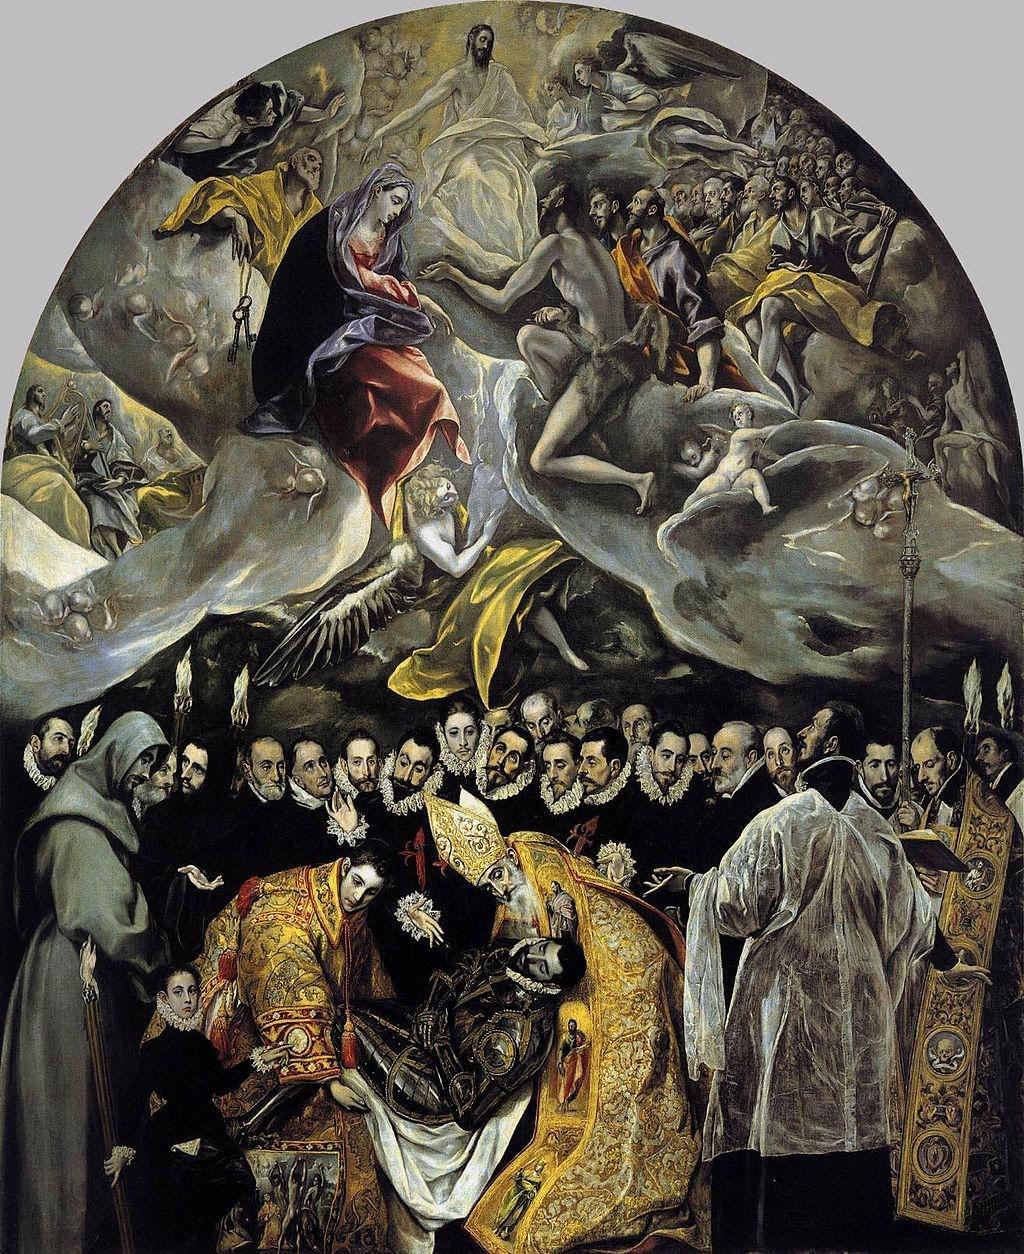 (圖1)《歐貴茲伯爵的葬禮》,艾爾.葛雷柯,1586-88,帆布油畫,高4.8米 寬3.65米,西班牙托萊多聖多默教堂,The Burial of the Count of Orgaz, El Greco, Iglesia de Santo Tome, Toledo, Spain